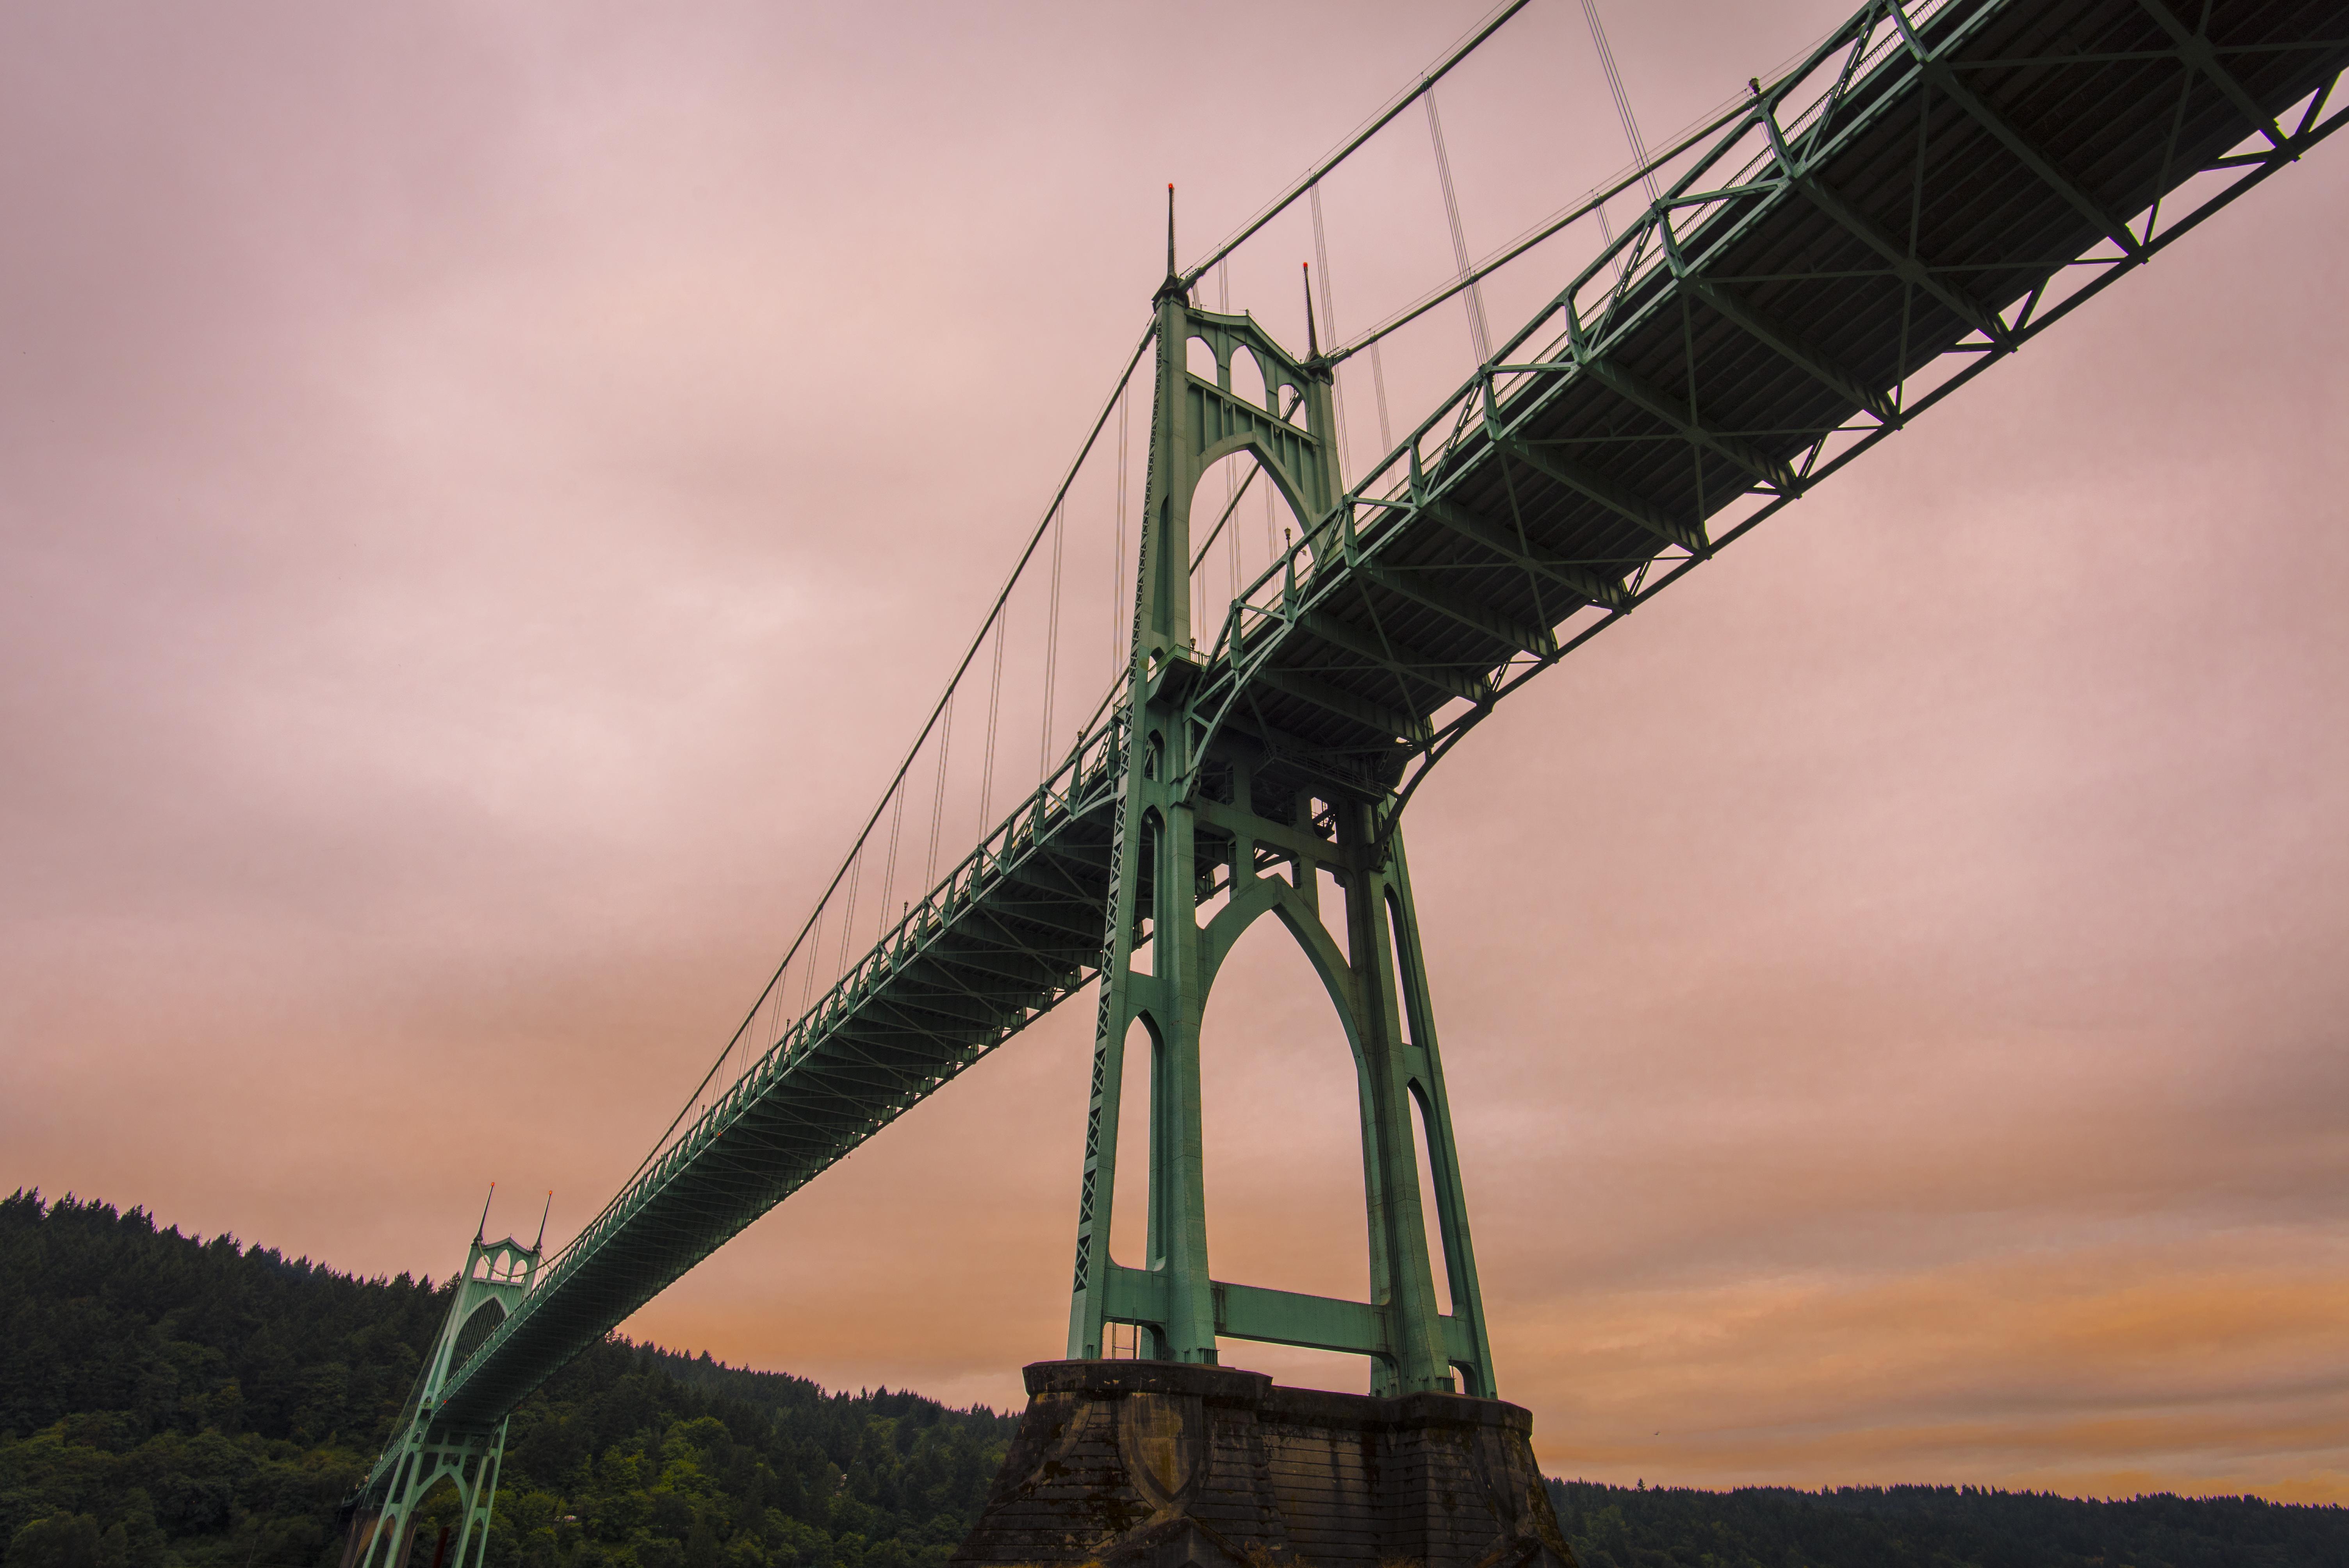 St John's Bridge, Portland, OR